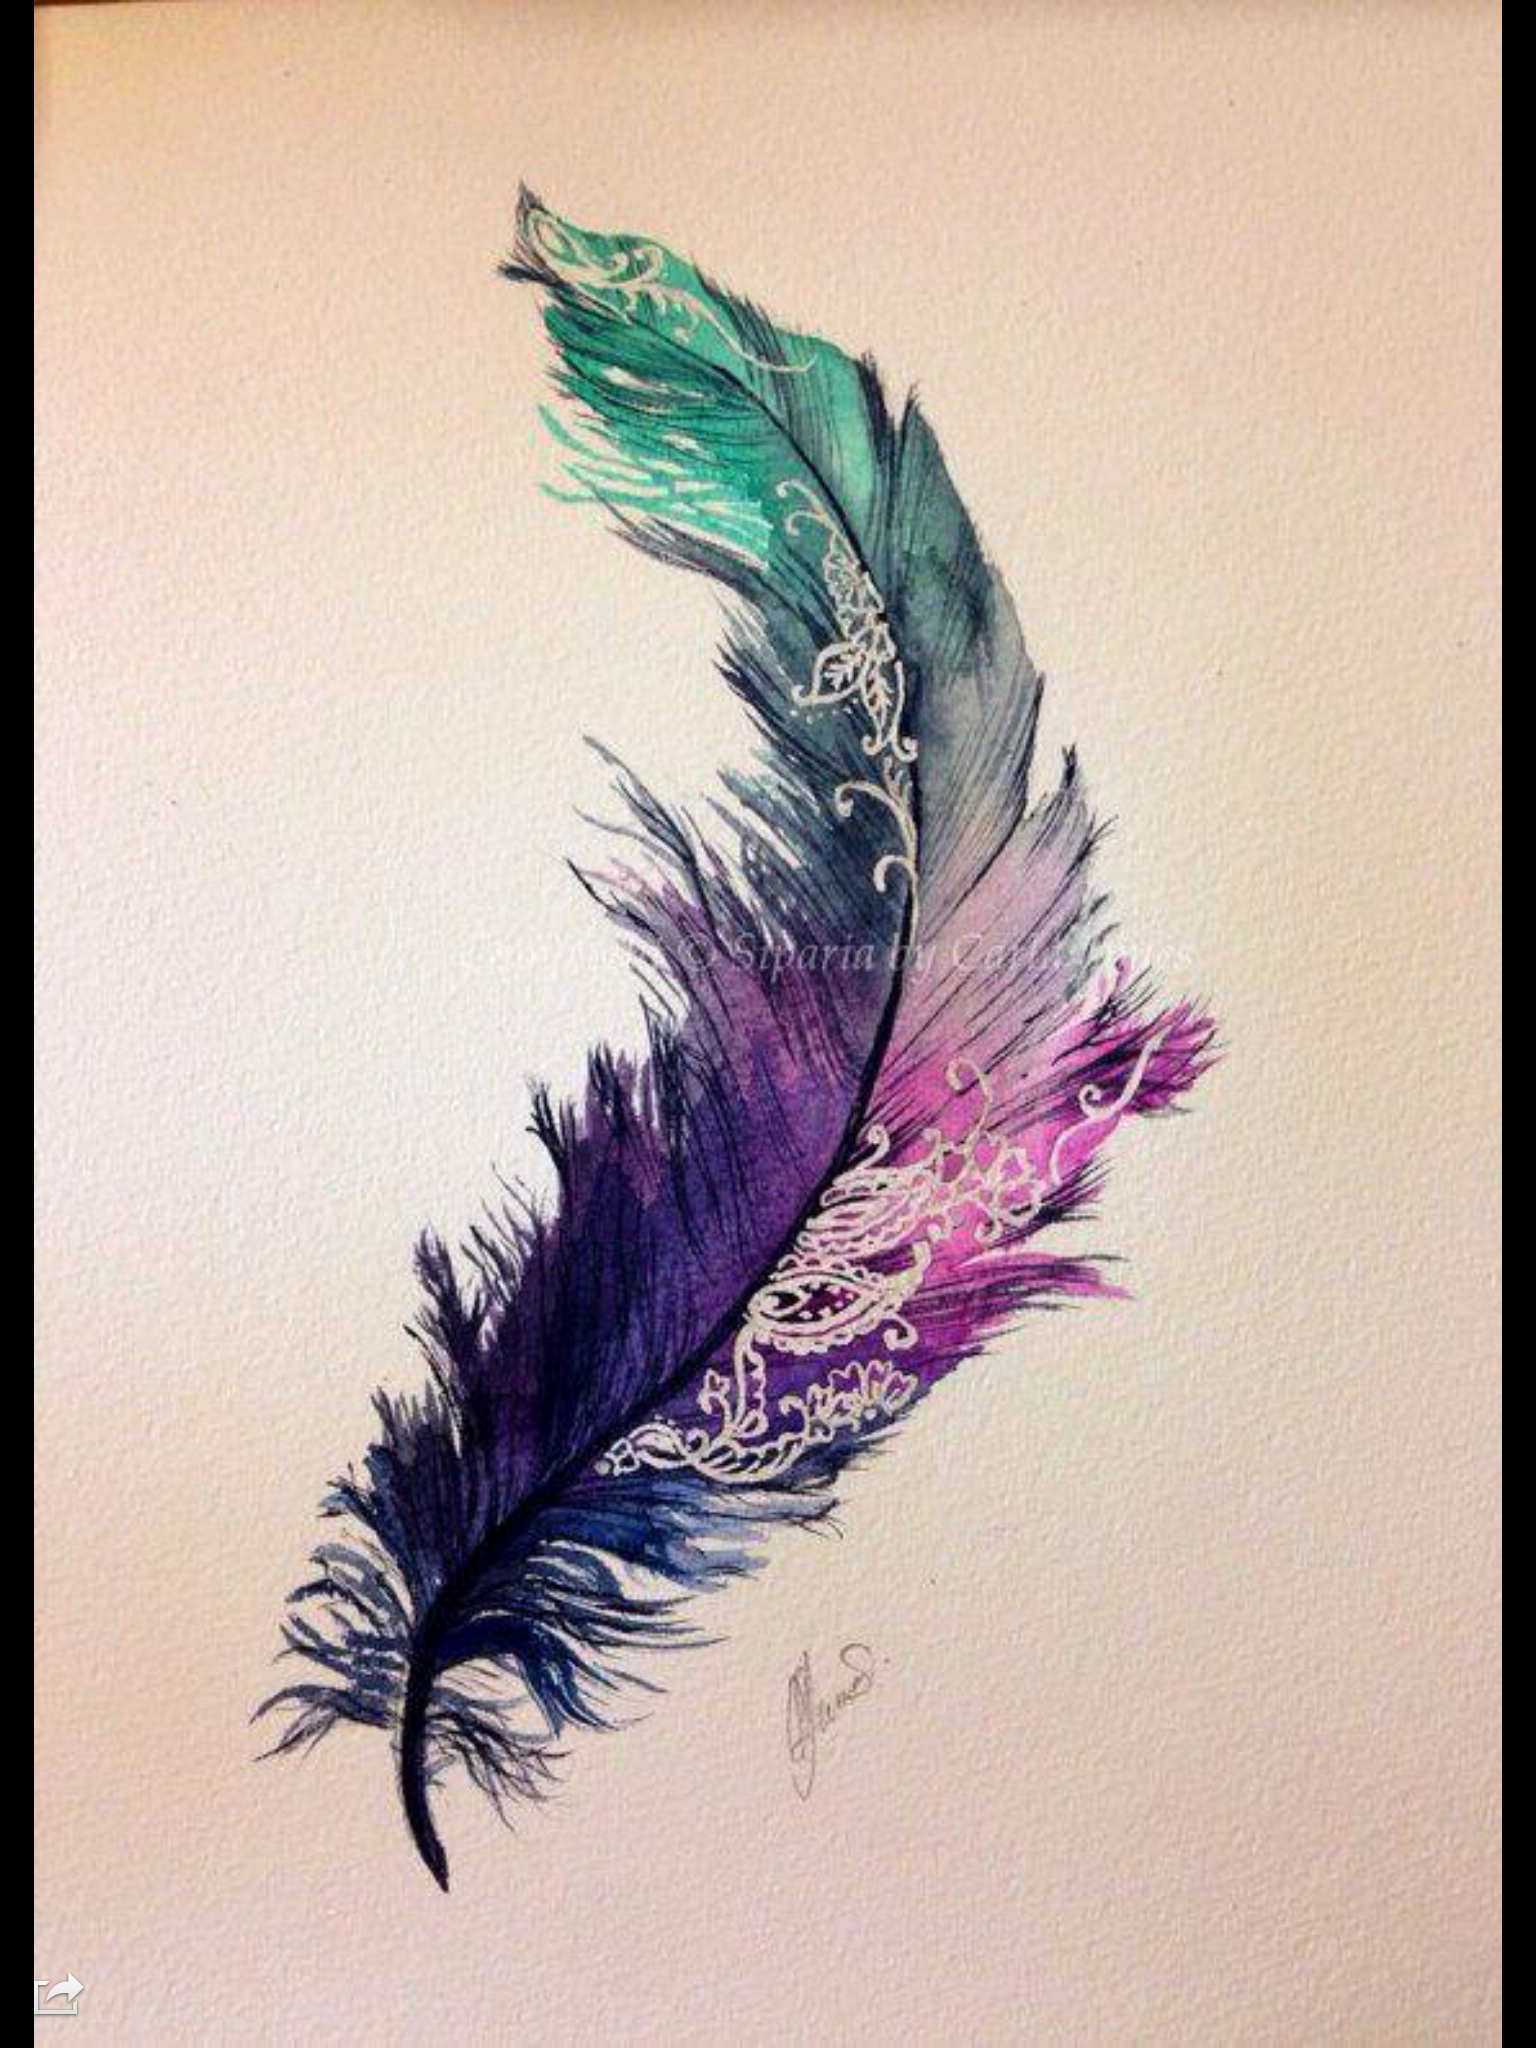 multi toned feather ink pinterest tattoo ideen aquarell tattoo und feder tattoo. Black Bedroom Furniture Sets. Home Design Ideas